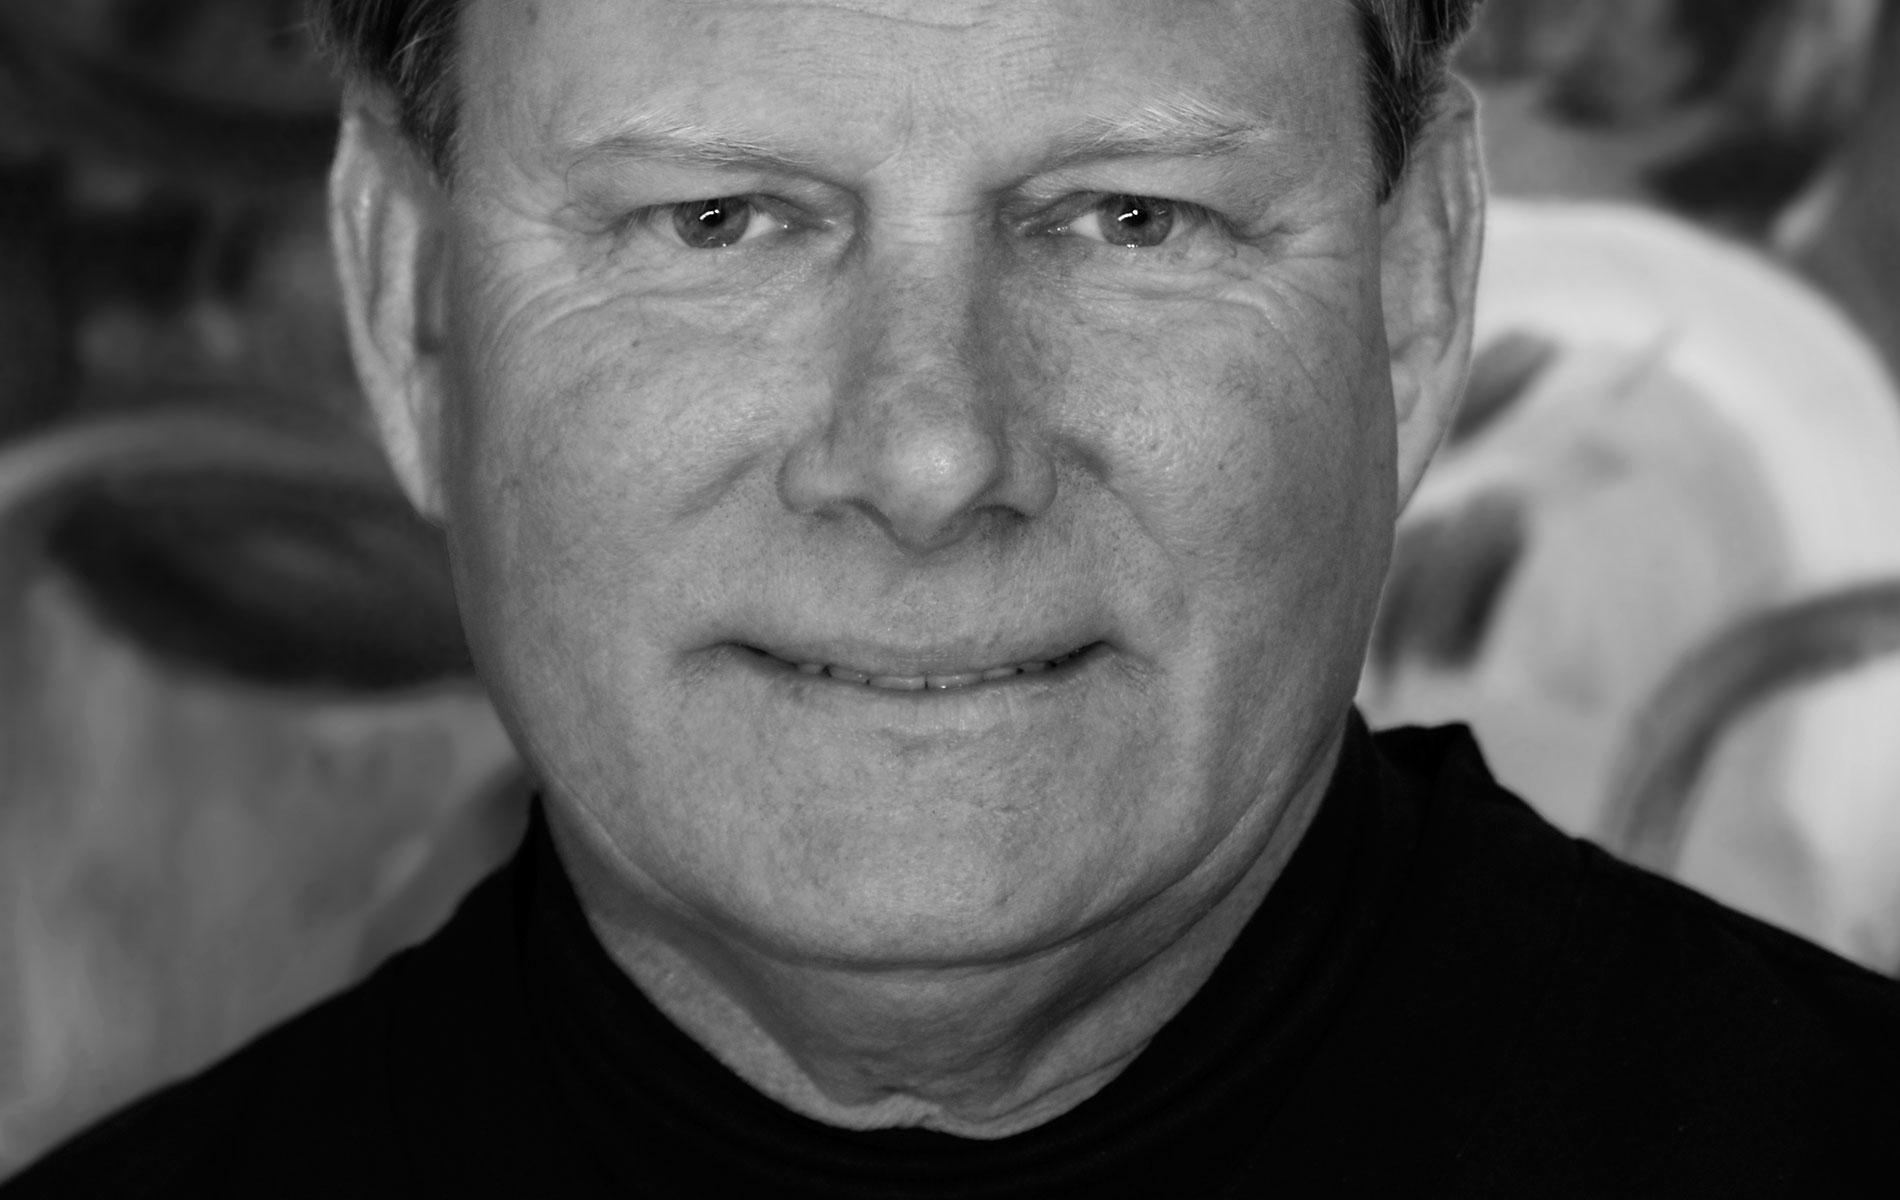 Ken Hair, Executive Director of Children in Crisis